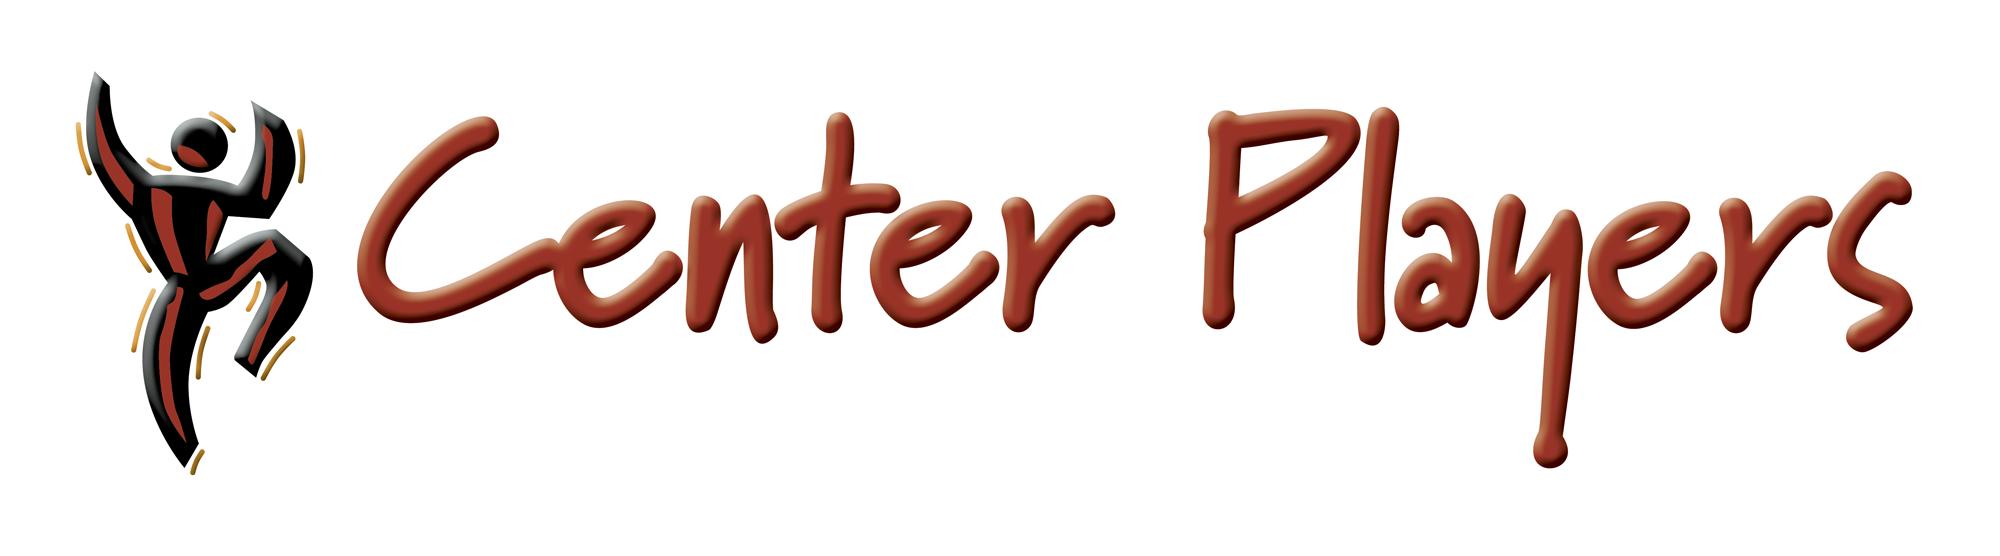 Center Players